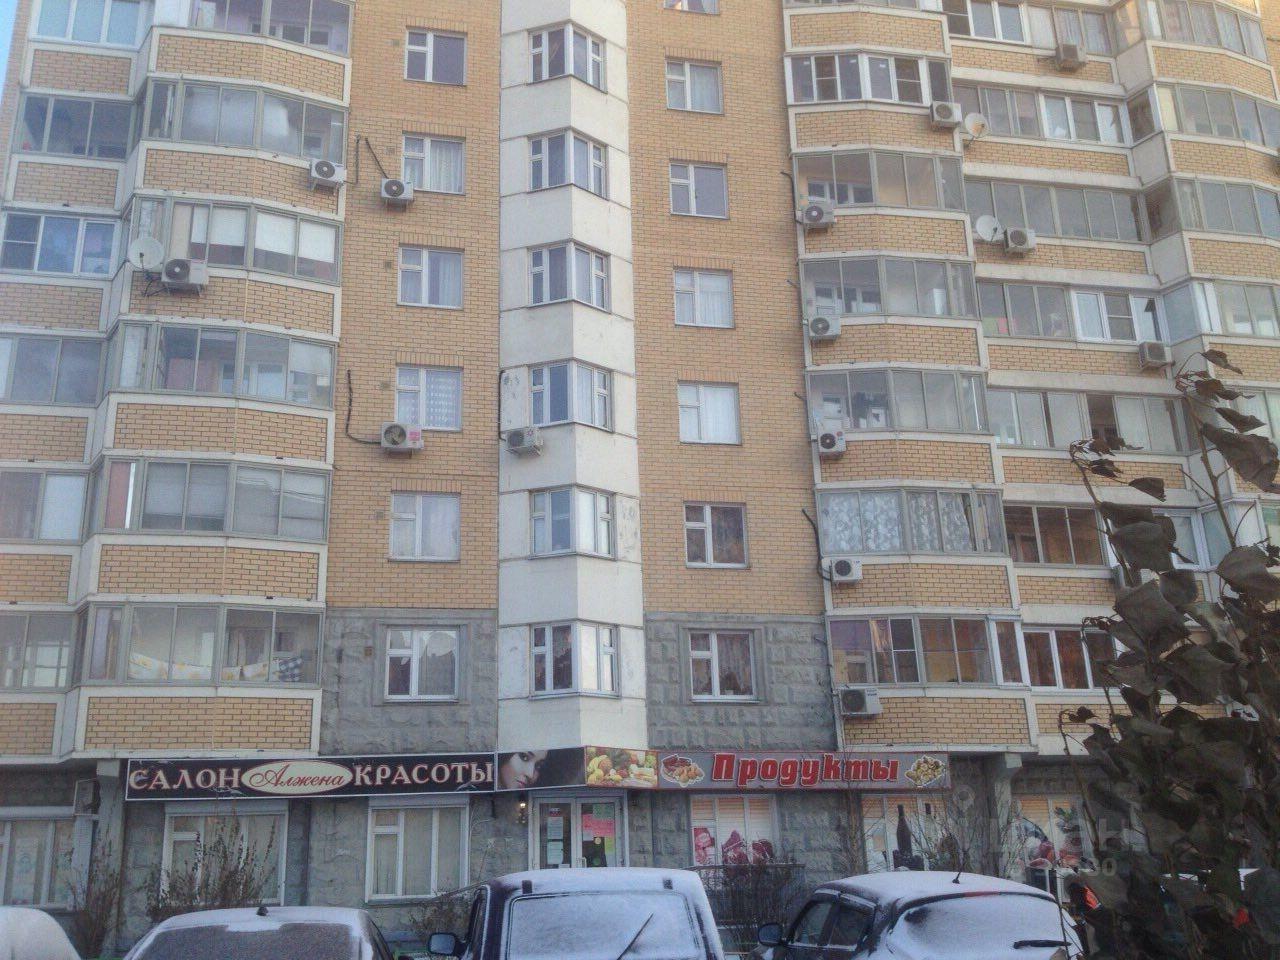 продаю трехкомнатную квартиру город Москва, метро Выхино, улица Рудневка, д. 41